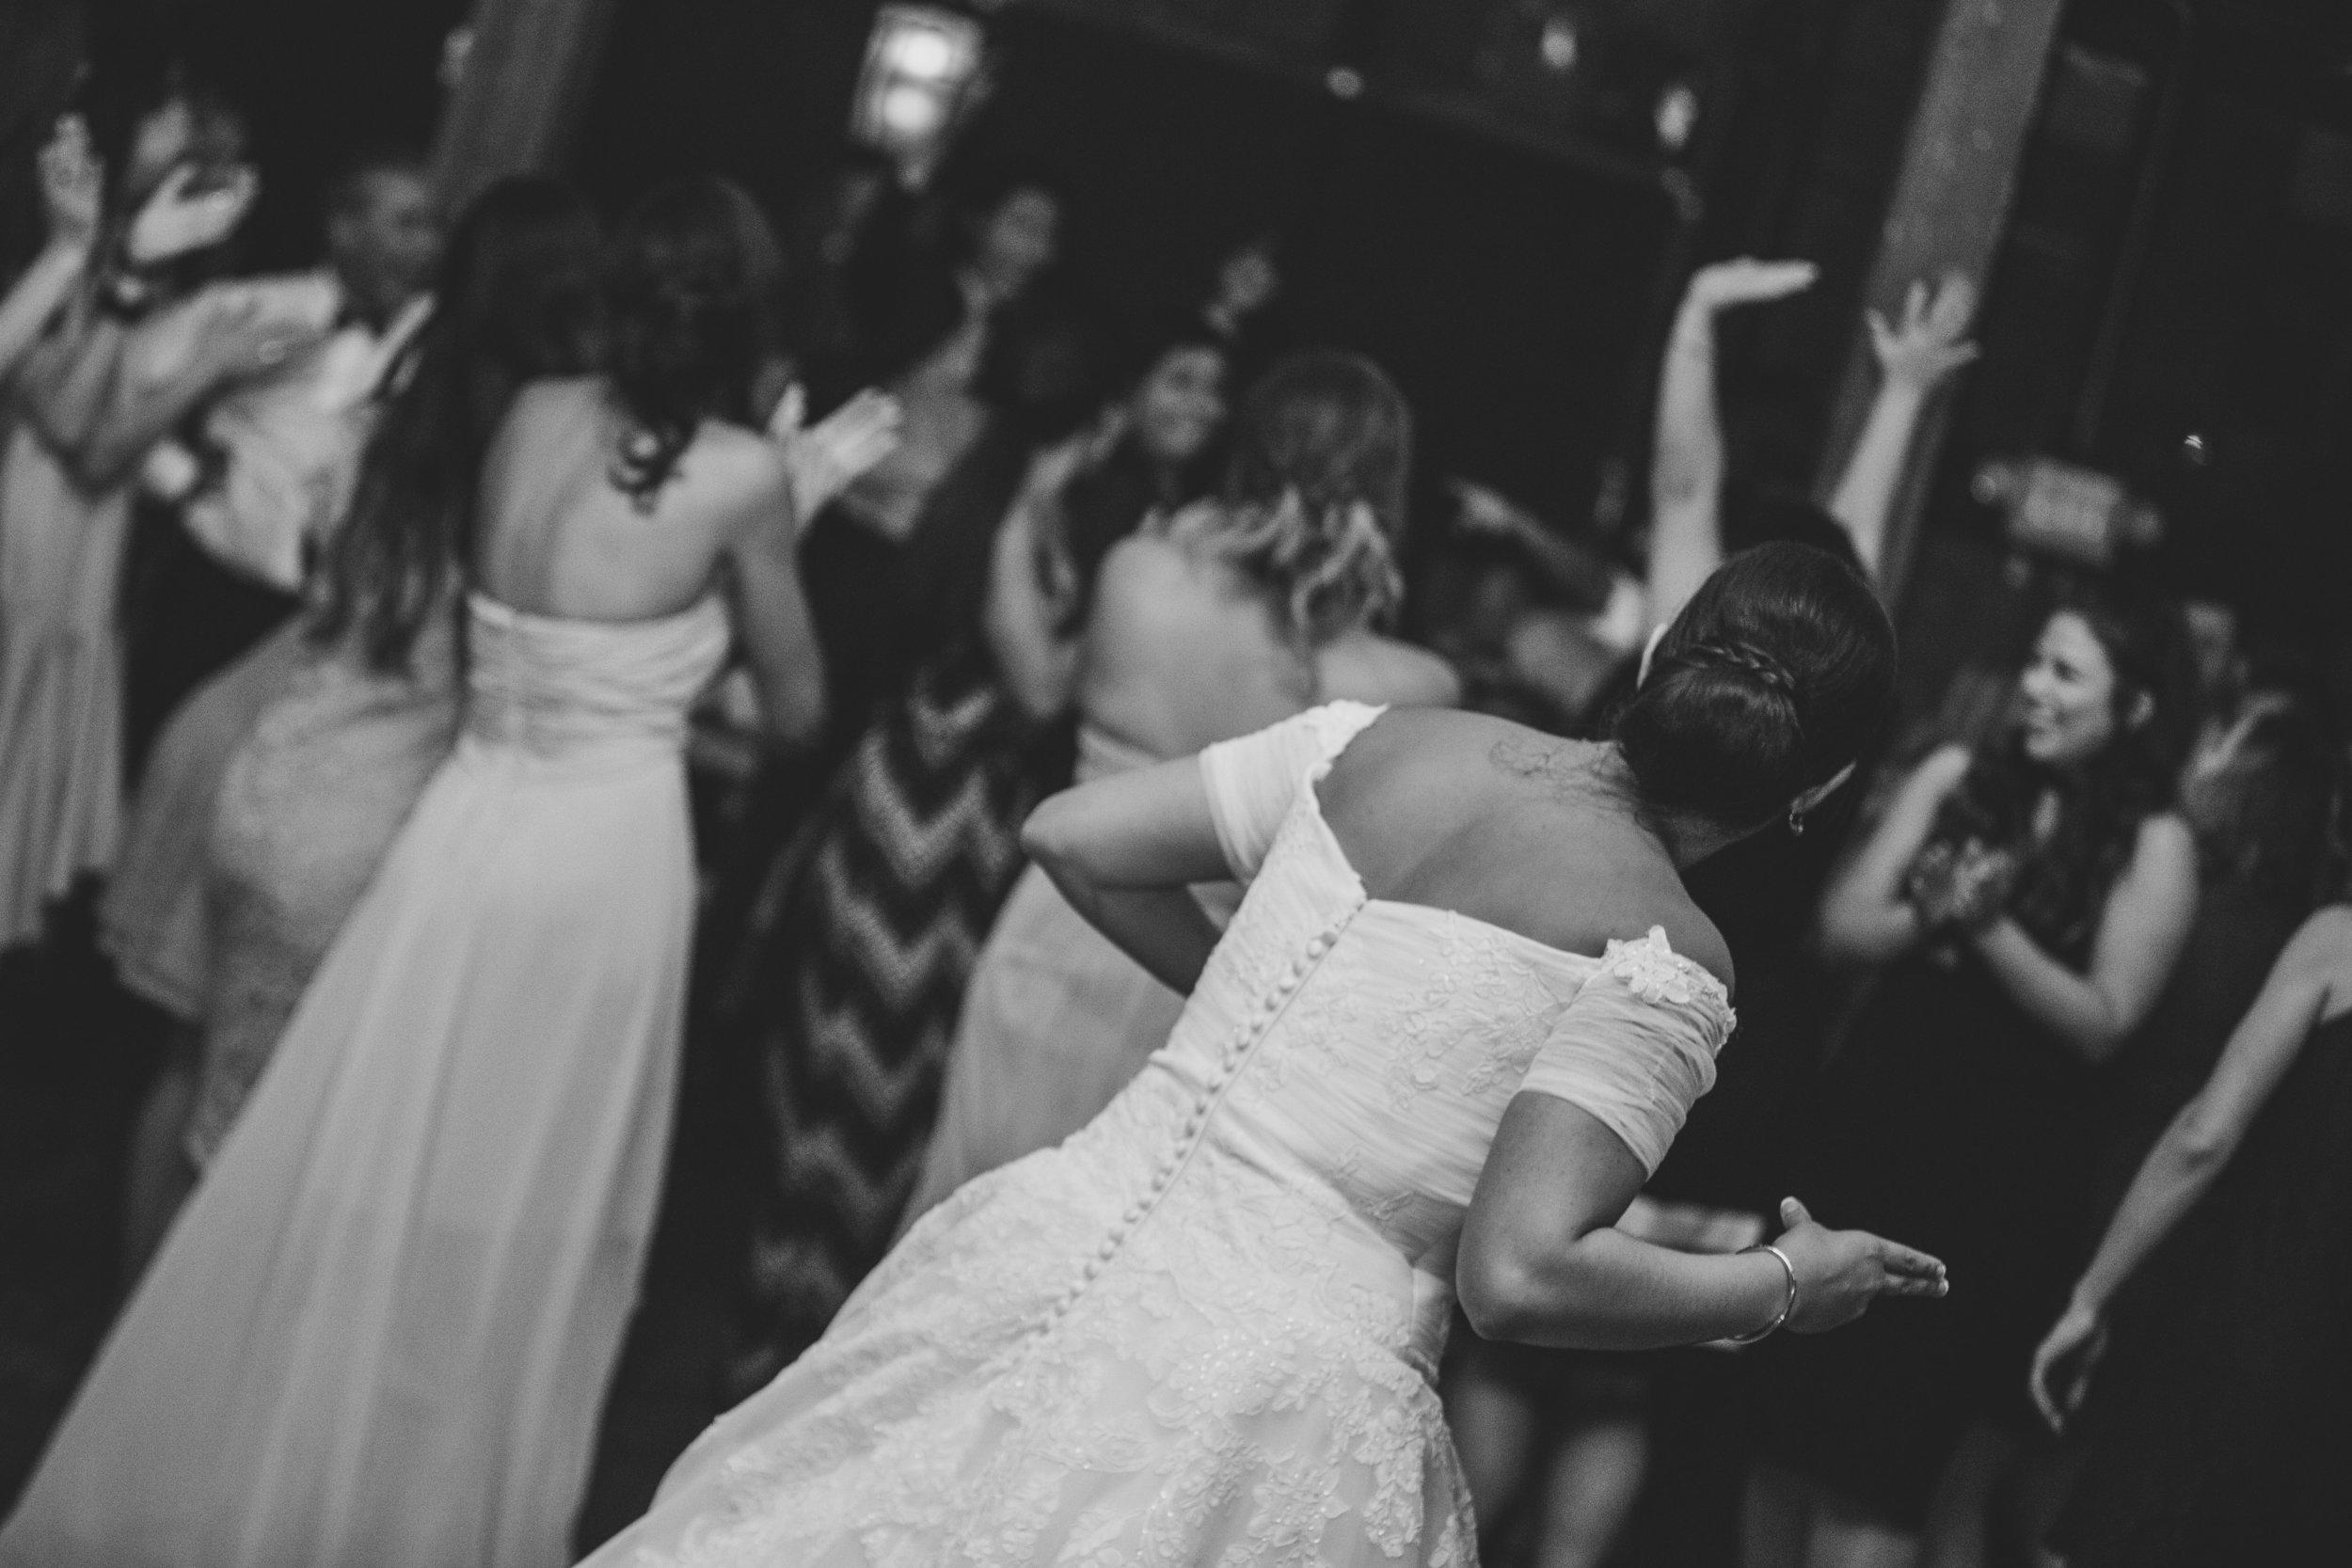 ATGI_Magali & Josh Wedding1_2S8A2515.jpg